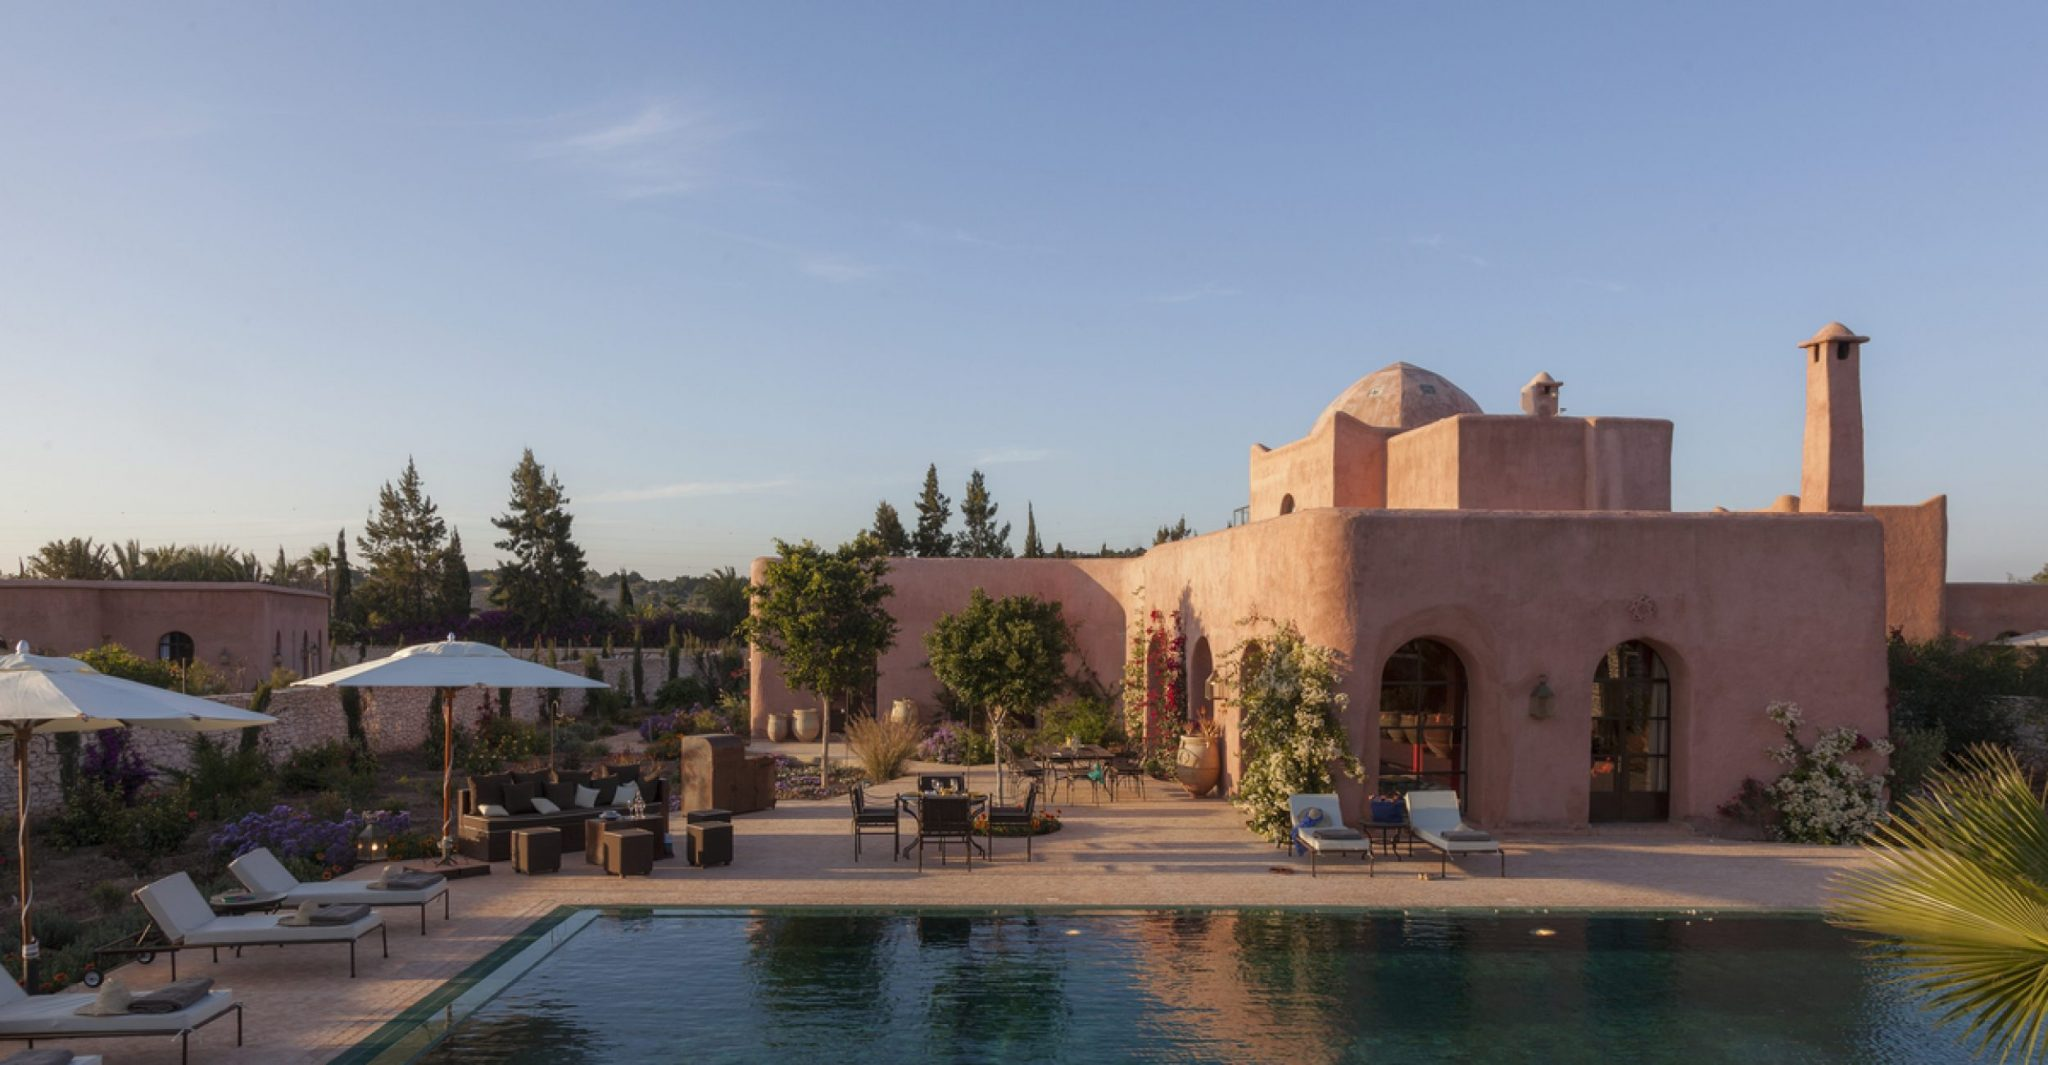 Villa primera a gorgeous luxury villa in essaouira morocco - Les jardins de villa maroc essaouira ...